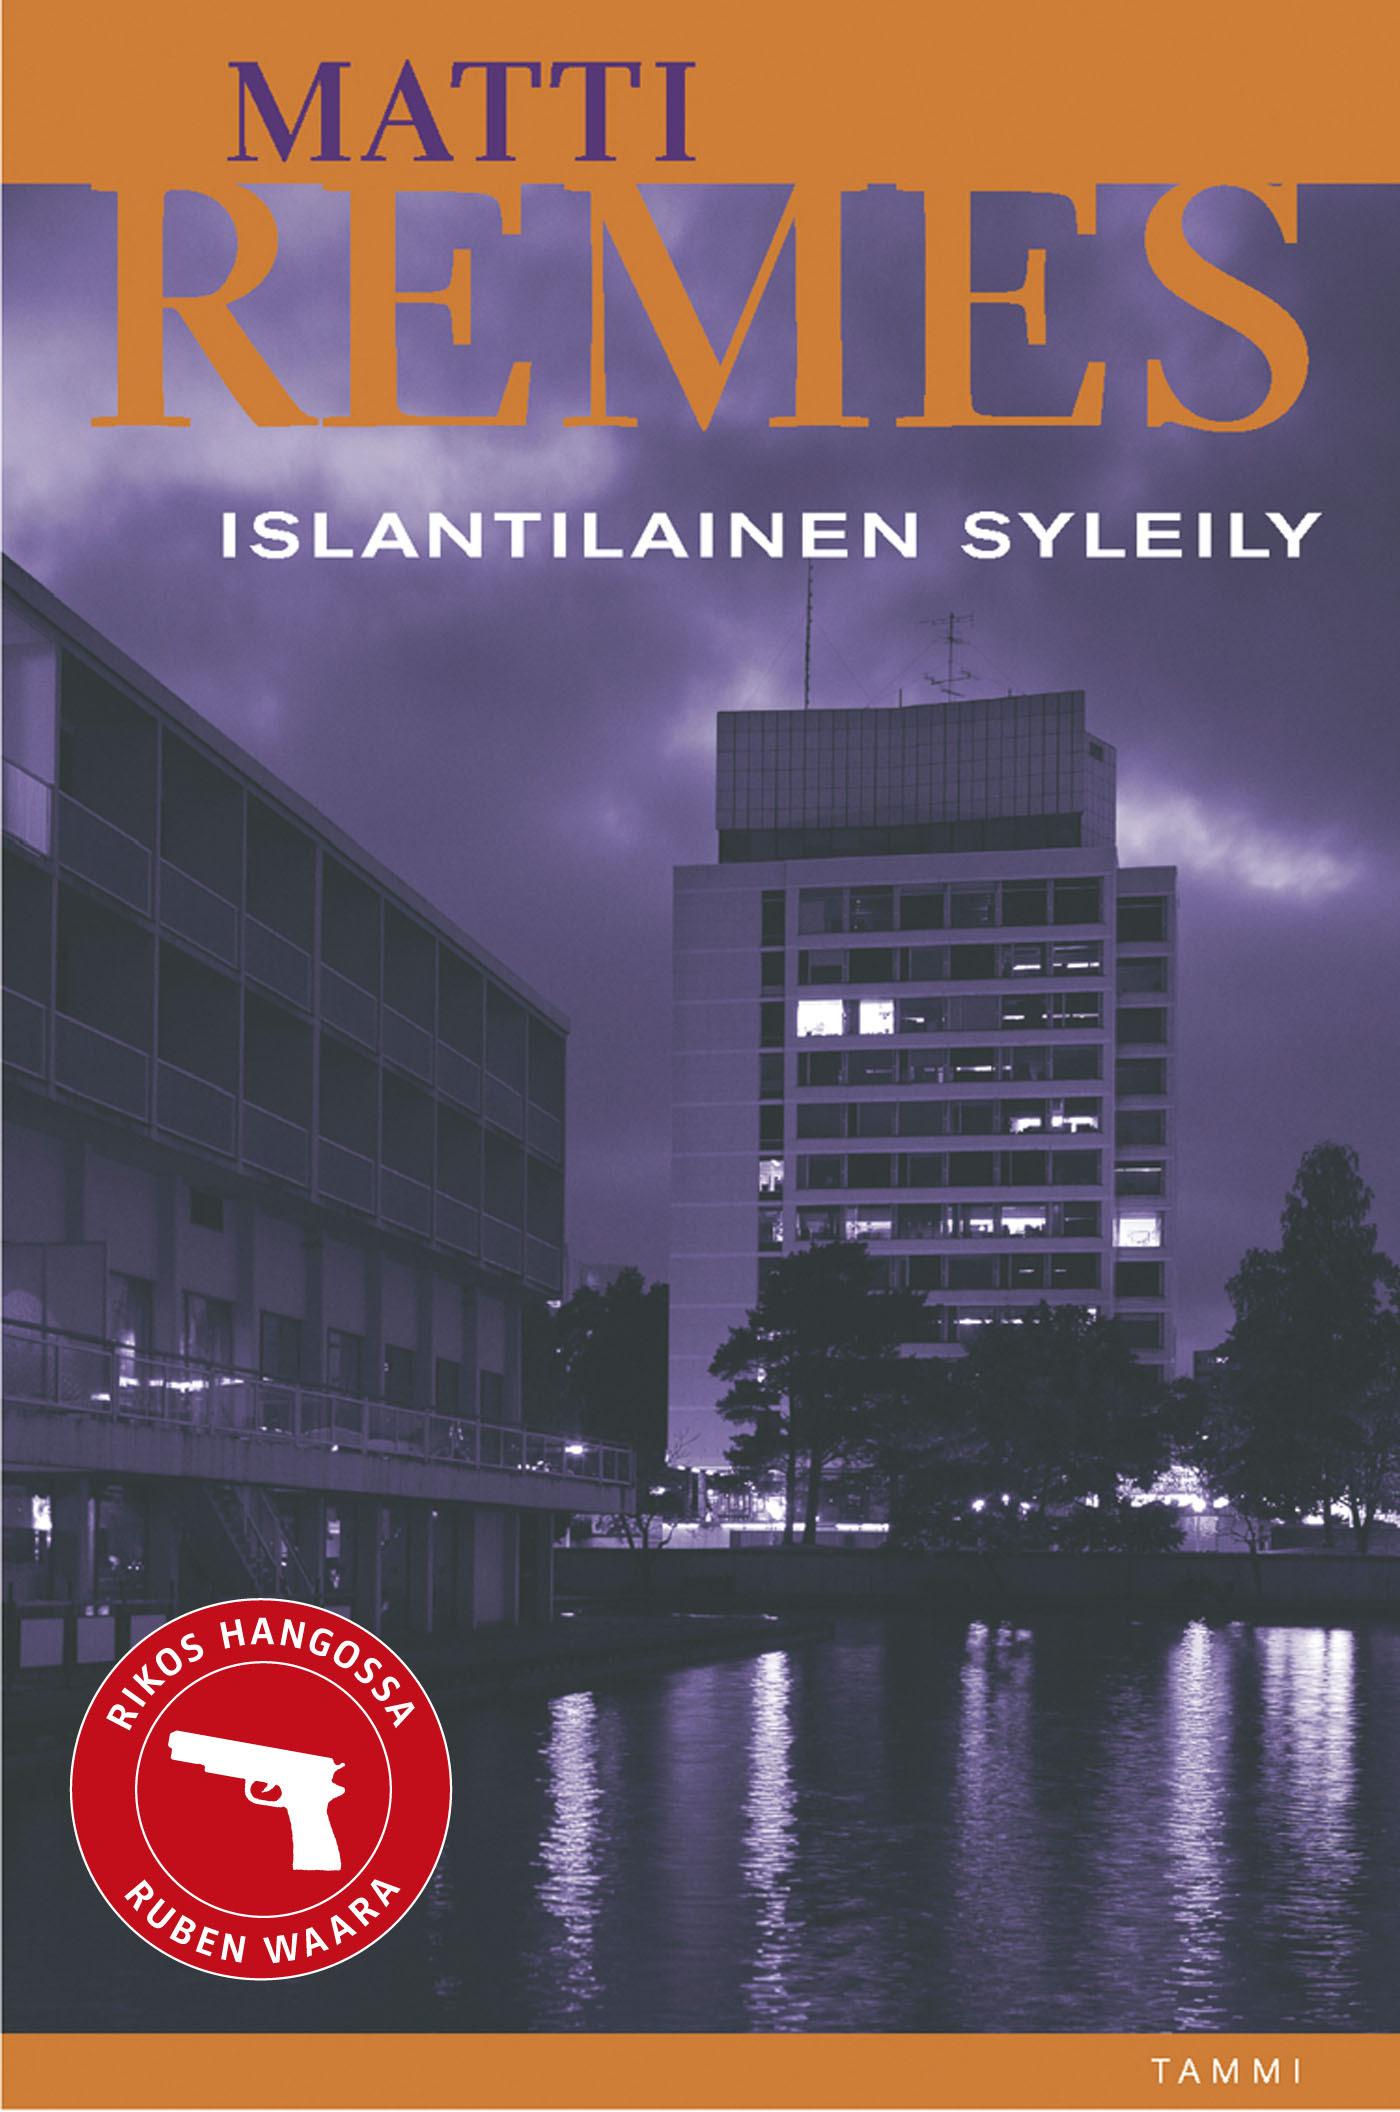 Remes, Matti - Islantilainen syleily, ebook